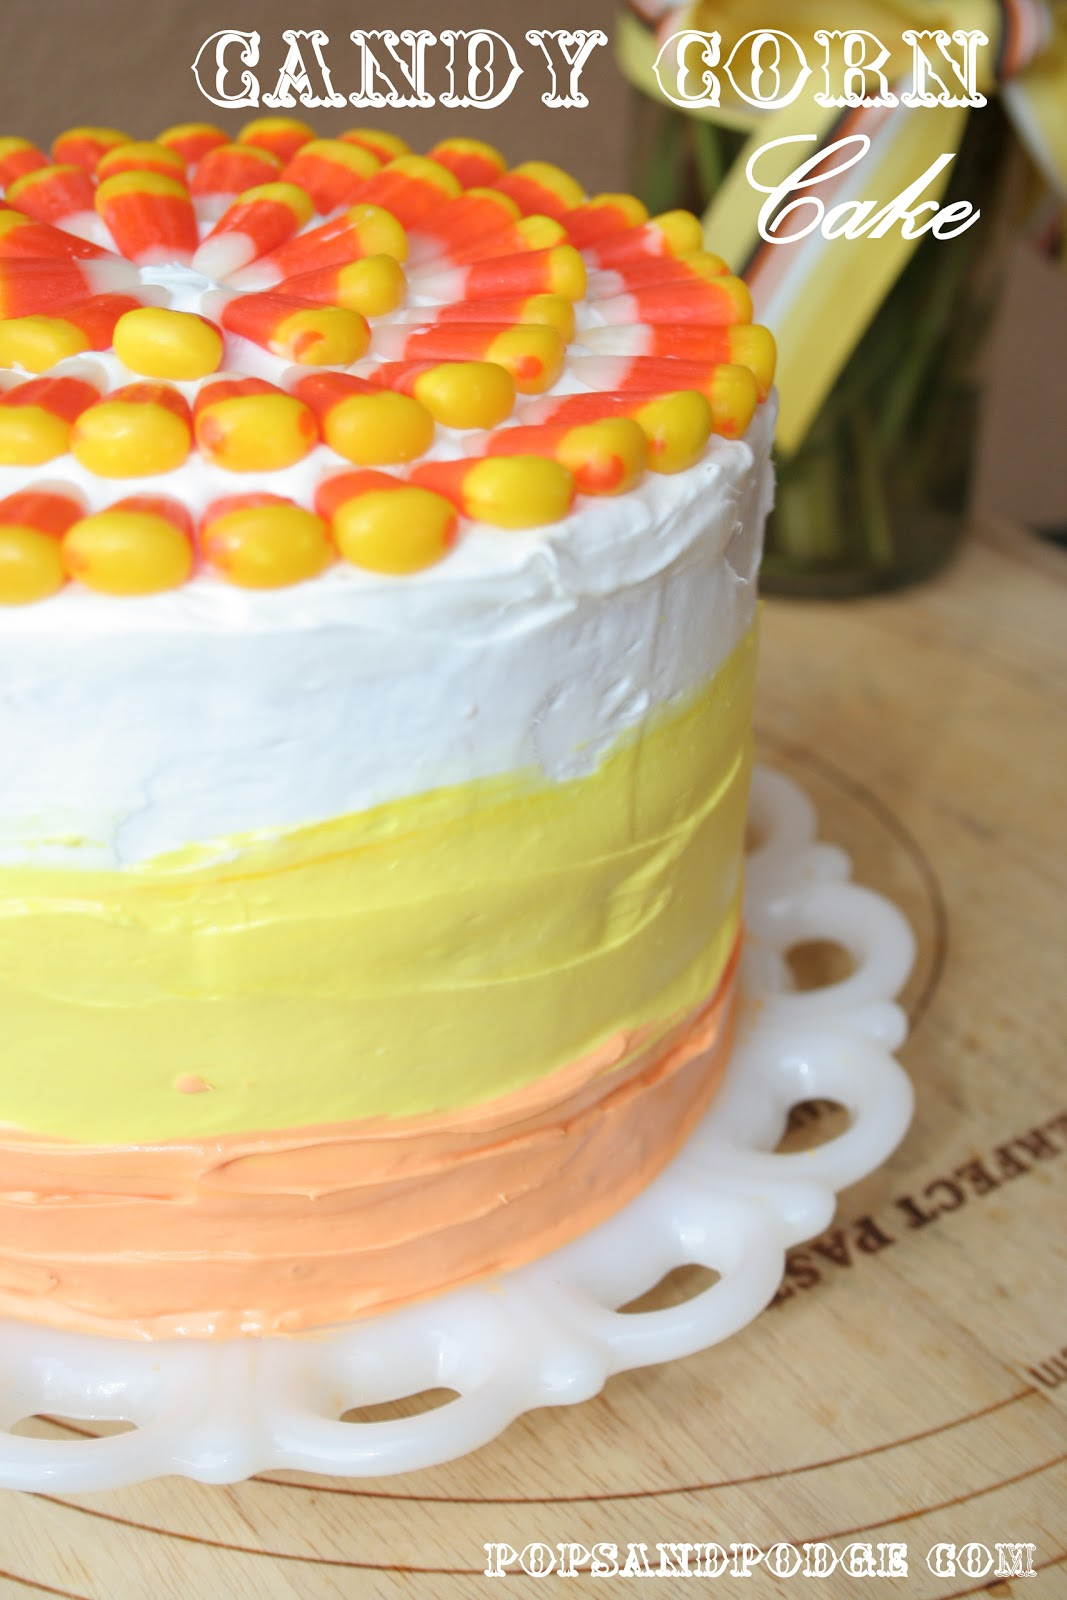 Pops And Podge Candy Corn Cakehappy Halloween